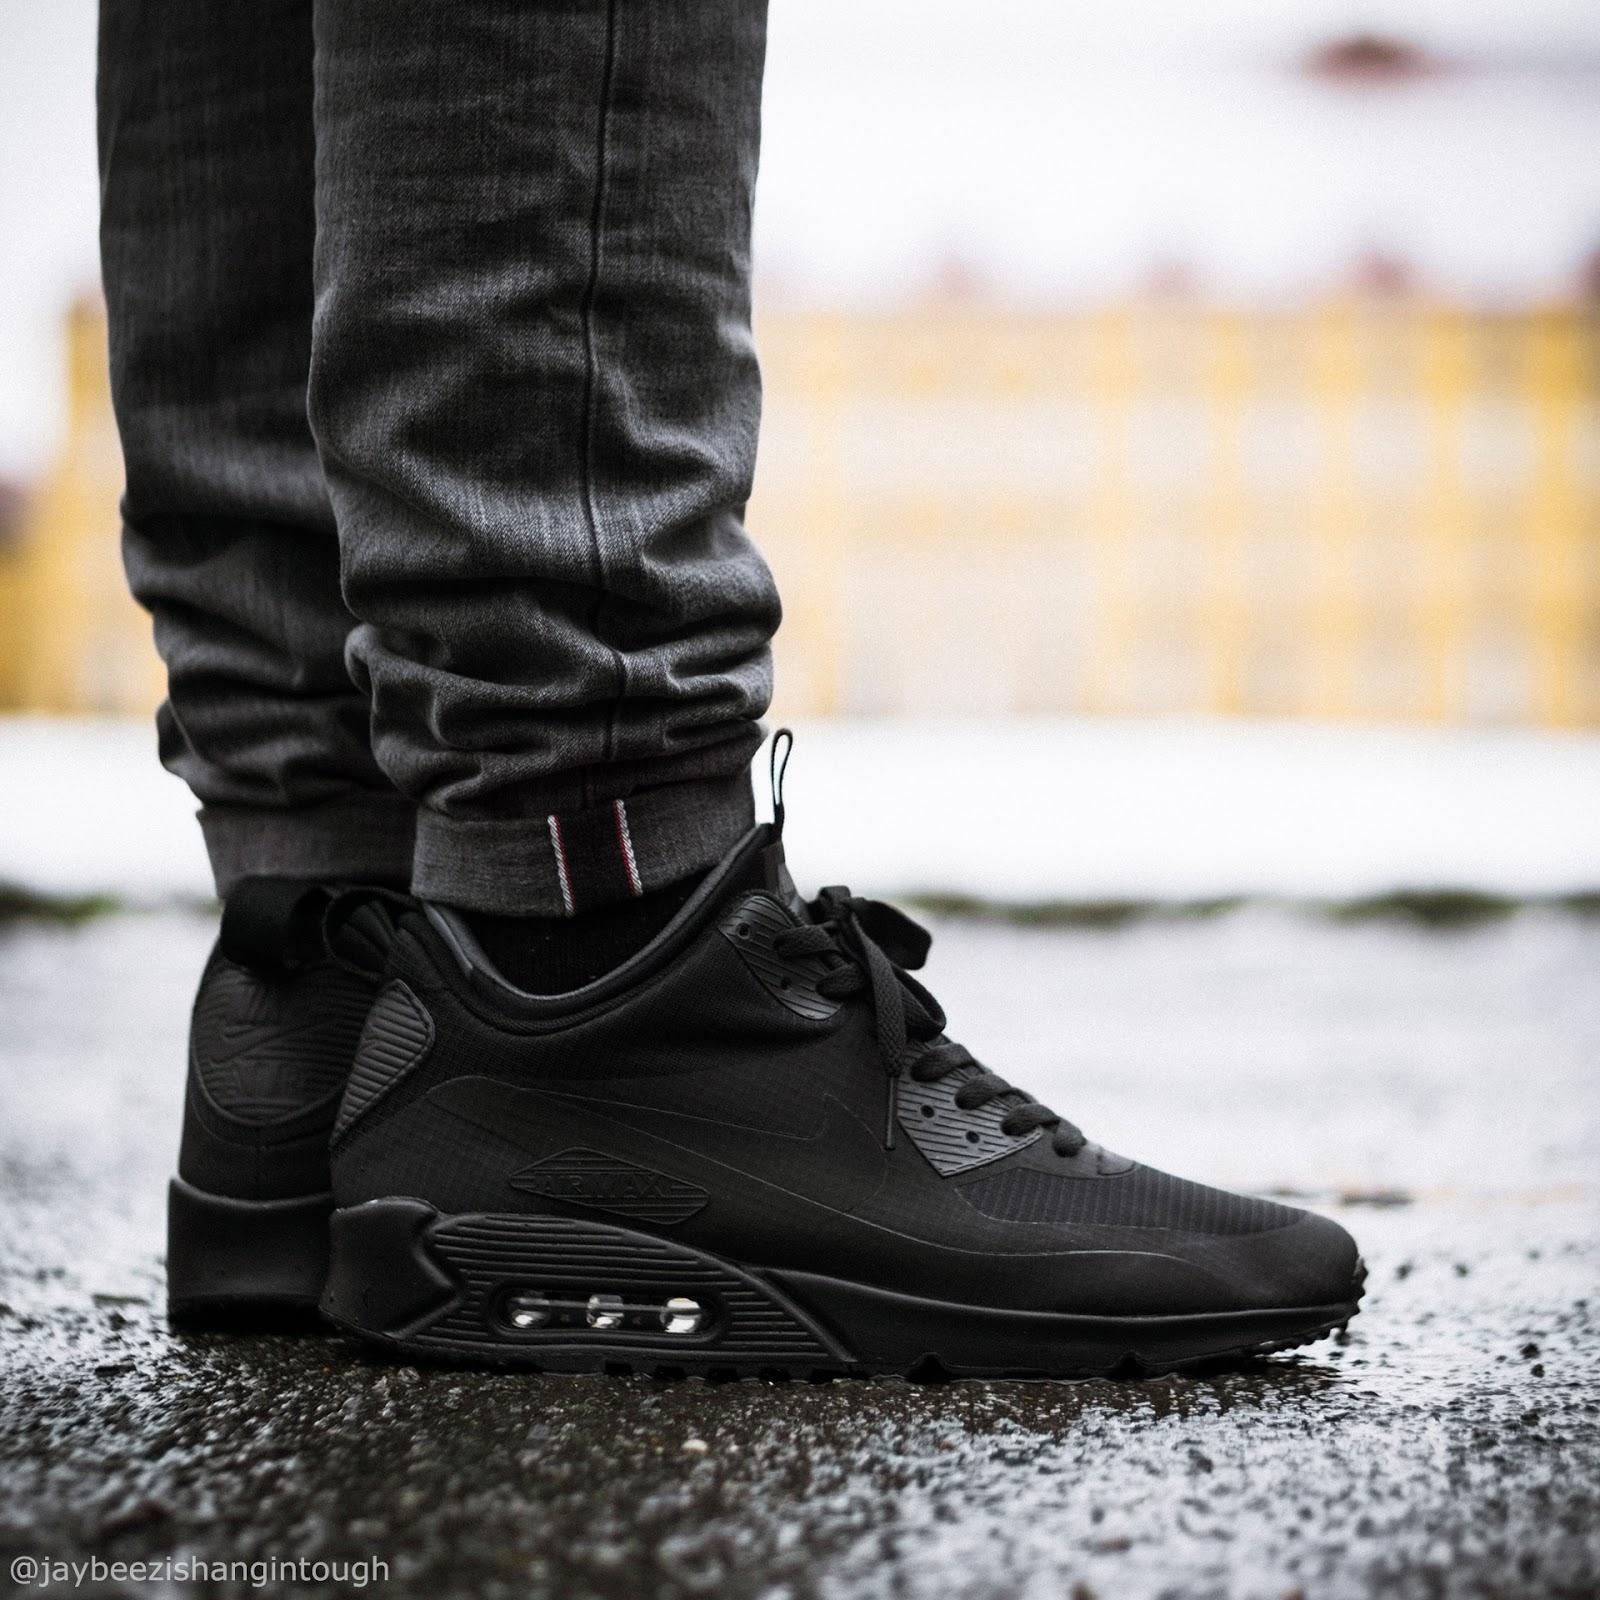 separation shoes 186d8 c9756 ... hoodie  Supreme x Hanes tagless tee  APC petit standard   RaisedByWolves toque beanie  TheNorthFace etip gloves  Nike air max 90  mid wntr